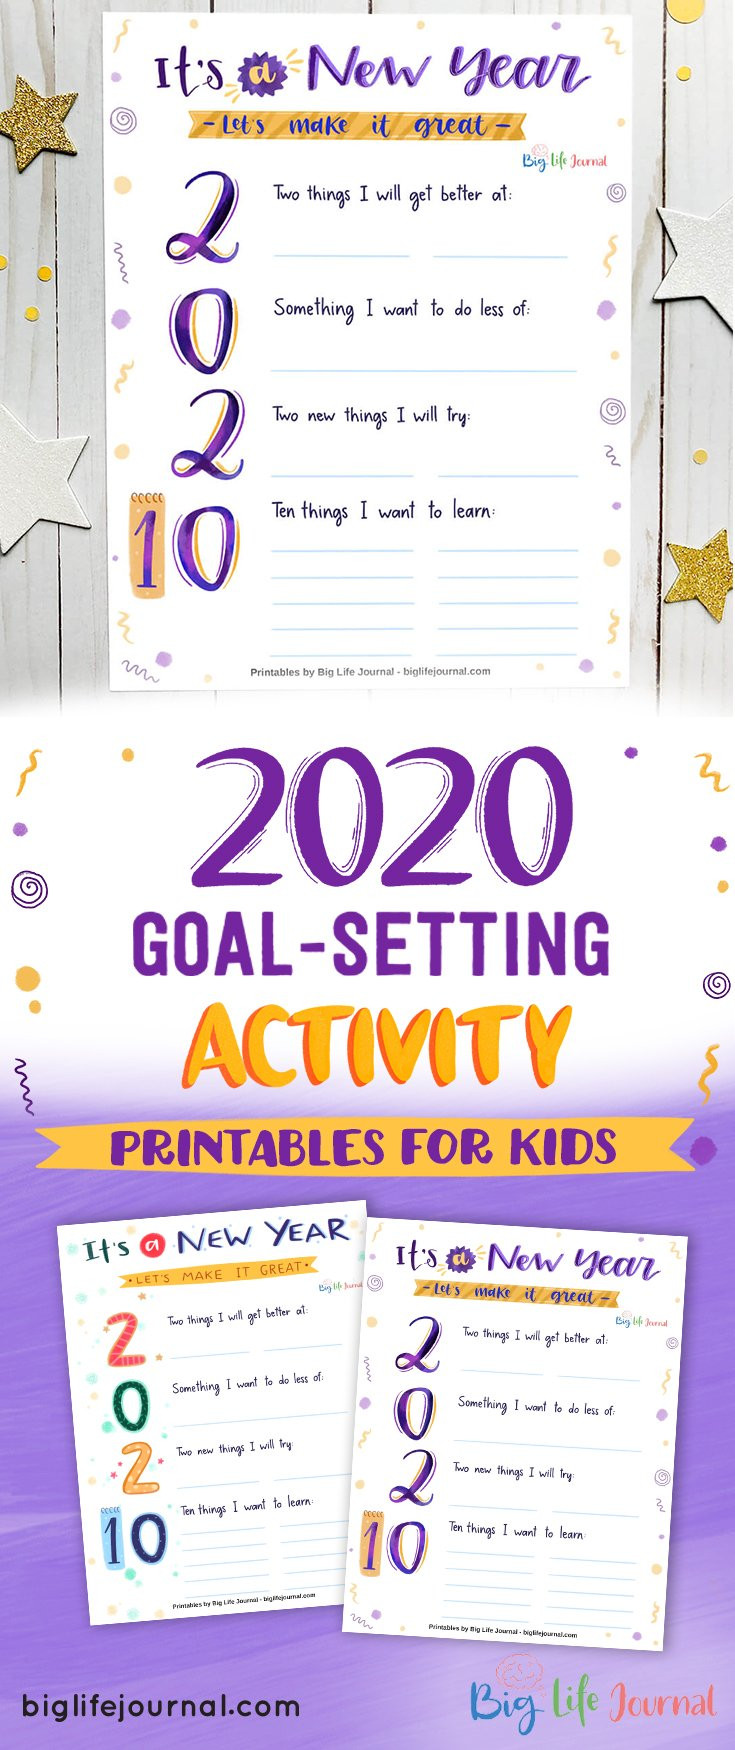 Tee Care 4U Academy - Big Life Journal - 2020 Goal Setting Activity